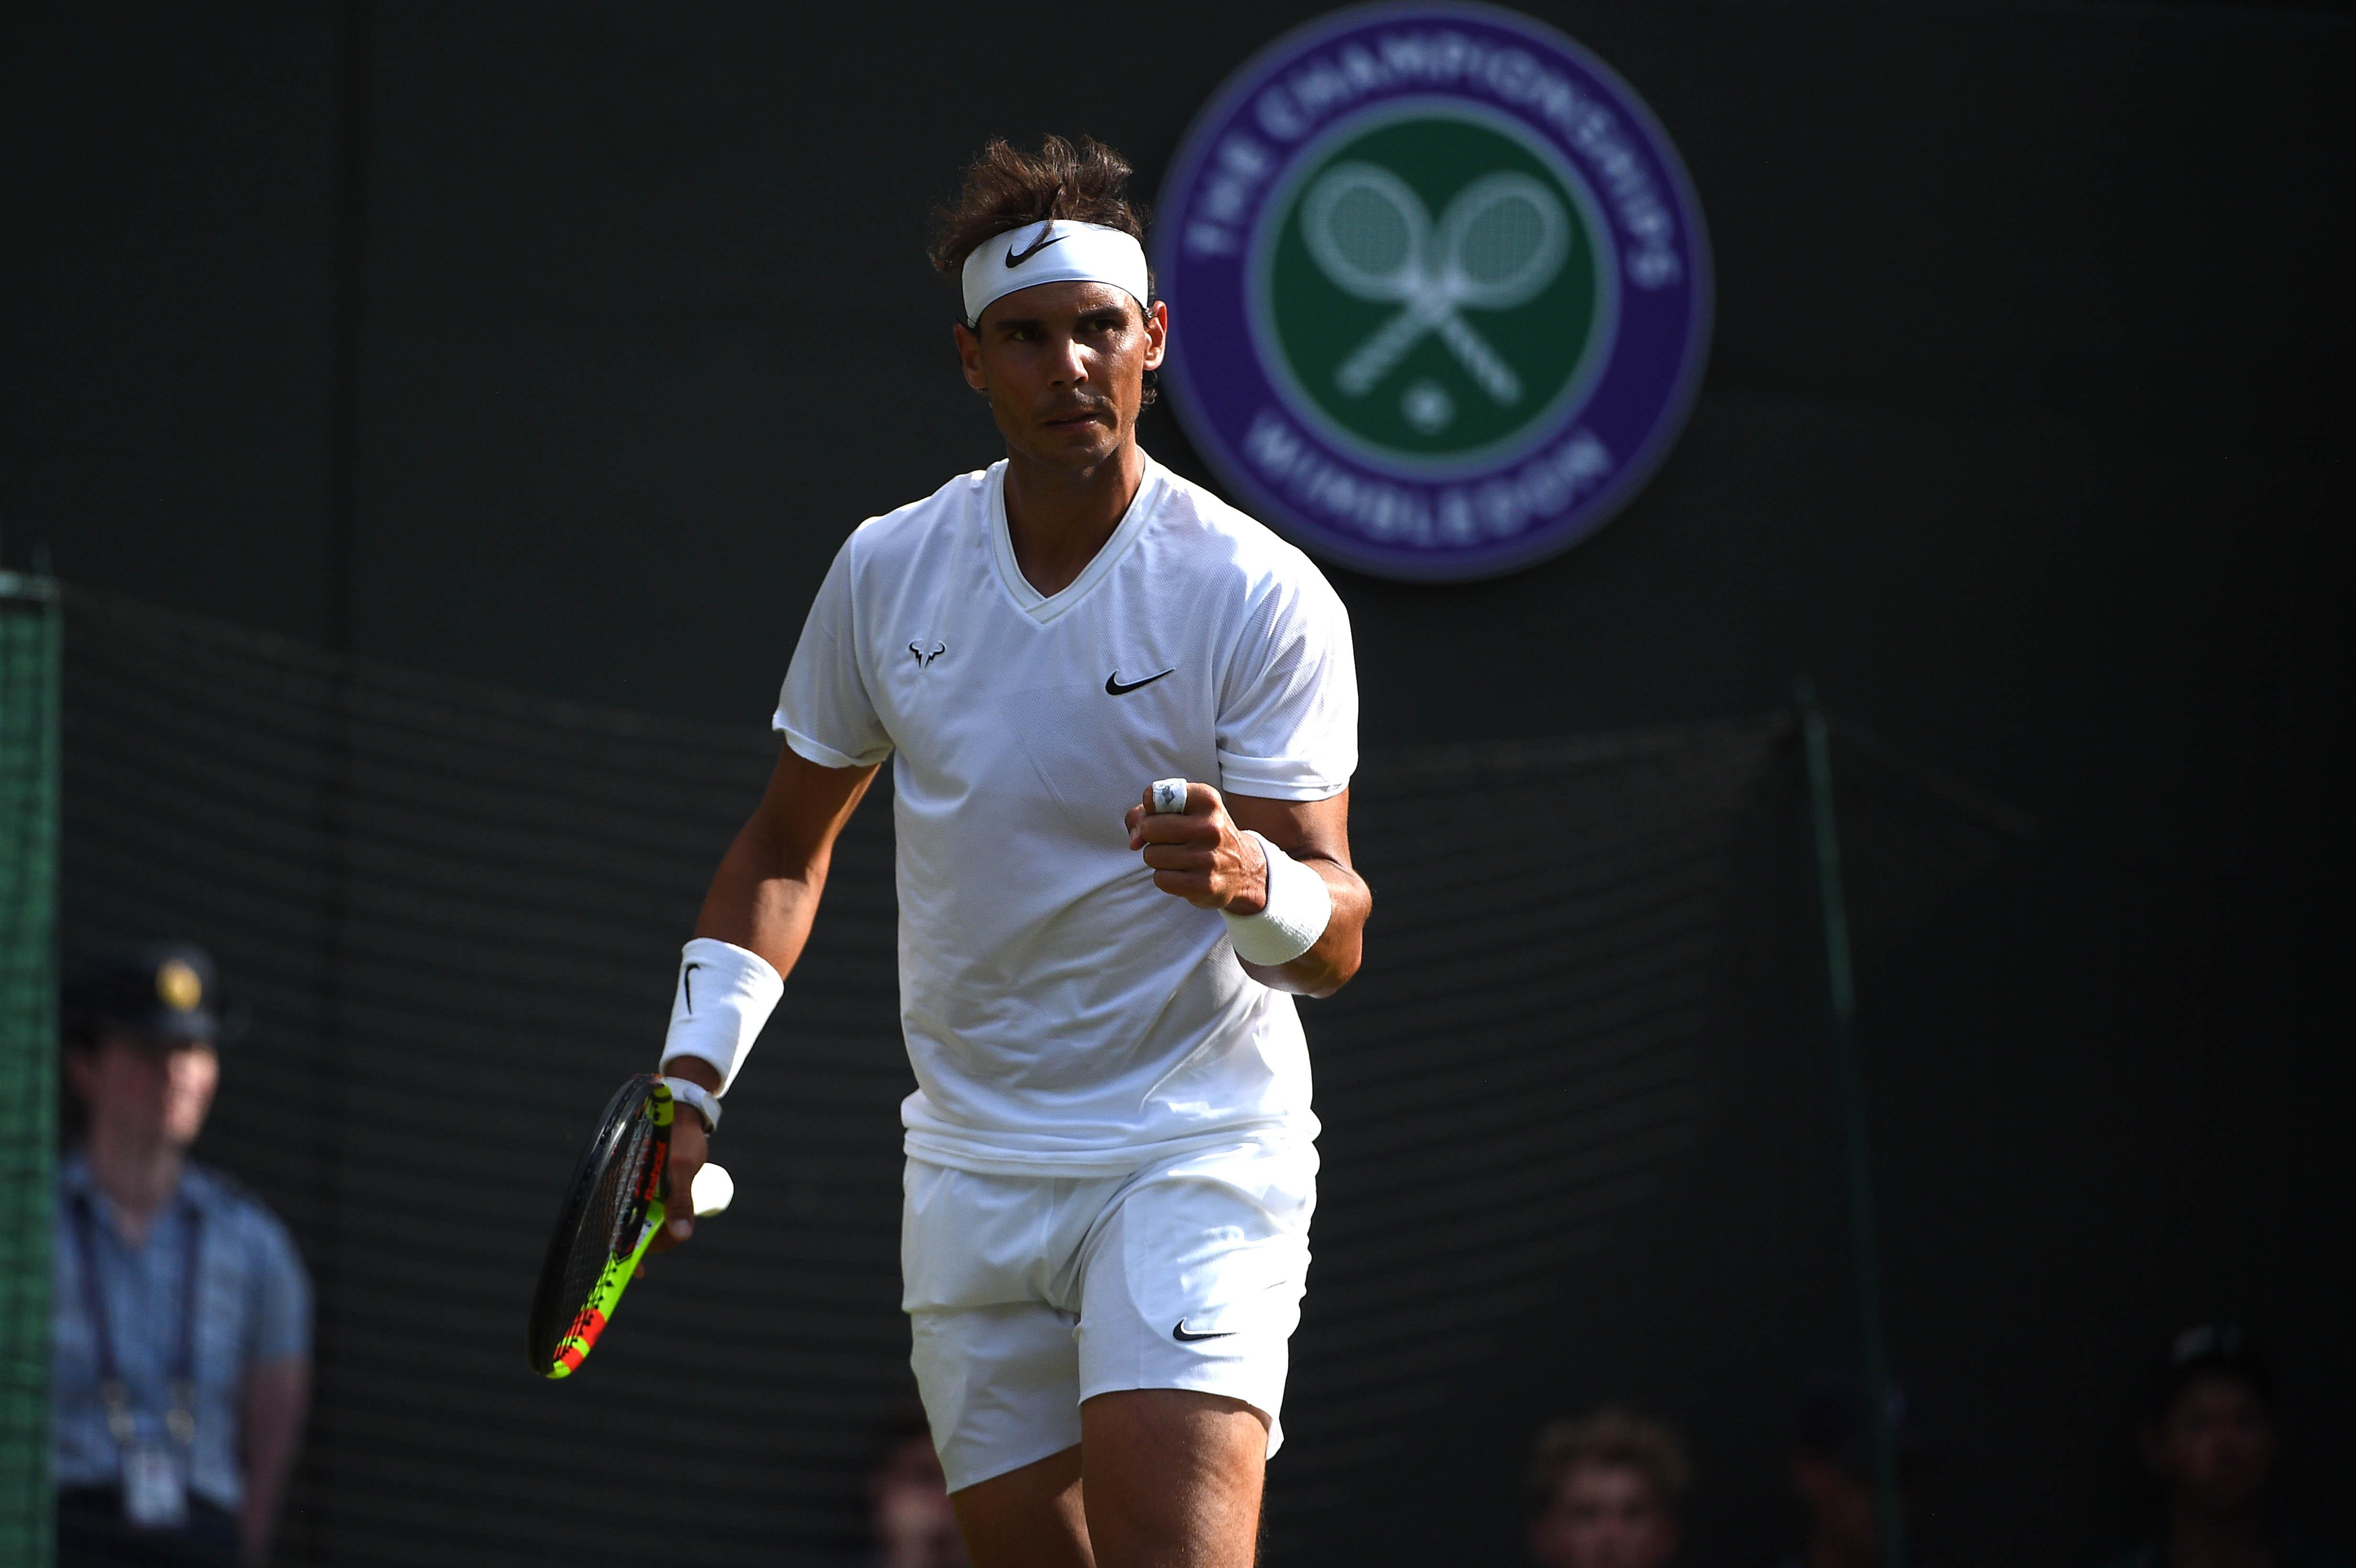 Rafael Nadal wins his first round at Wimbledon 2019